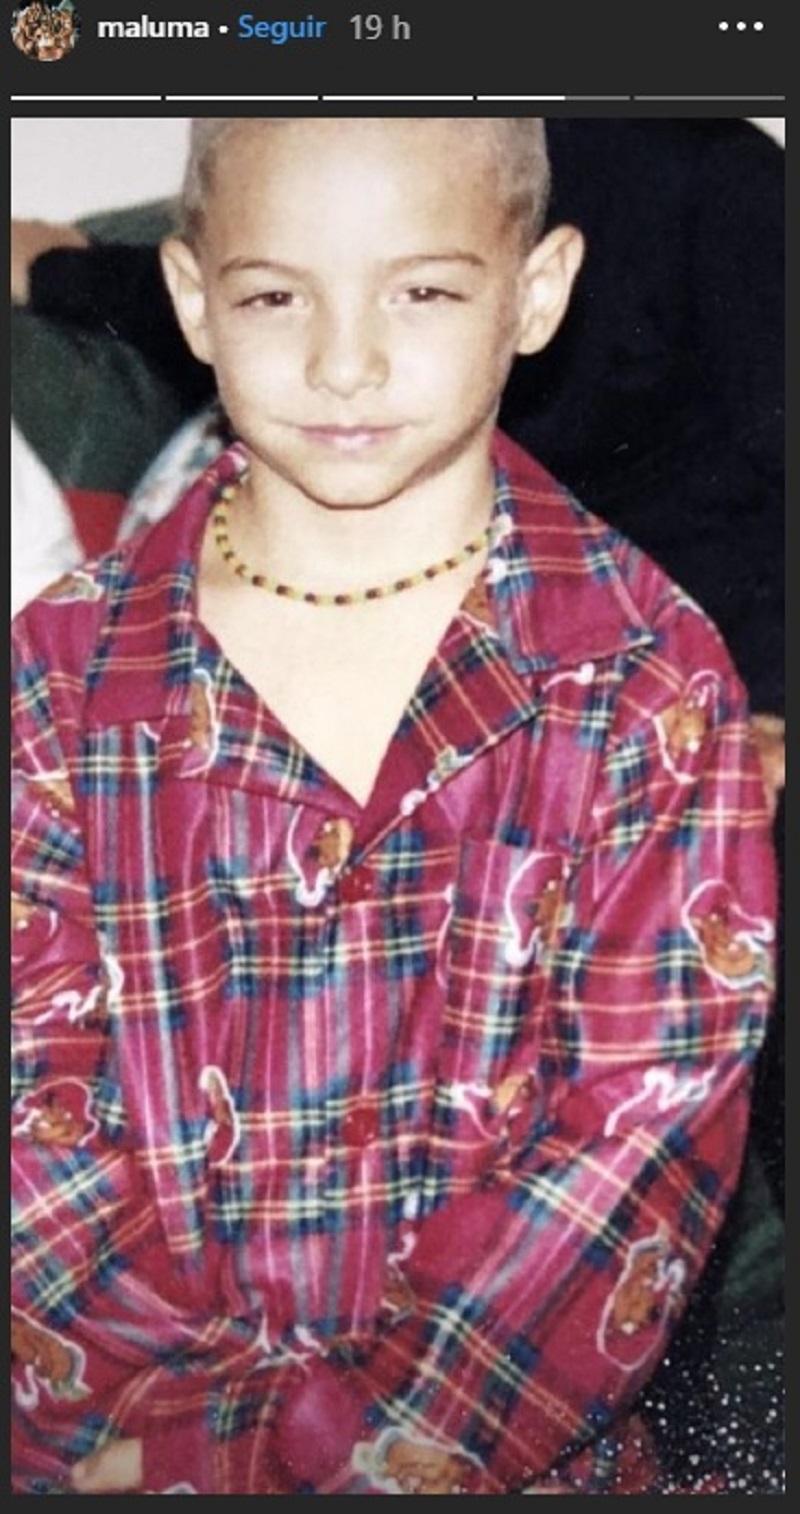 Niñez de Maluma